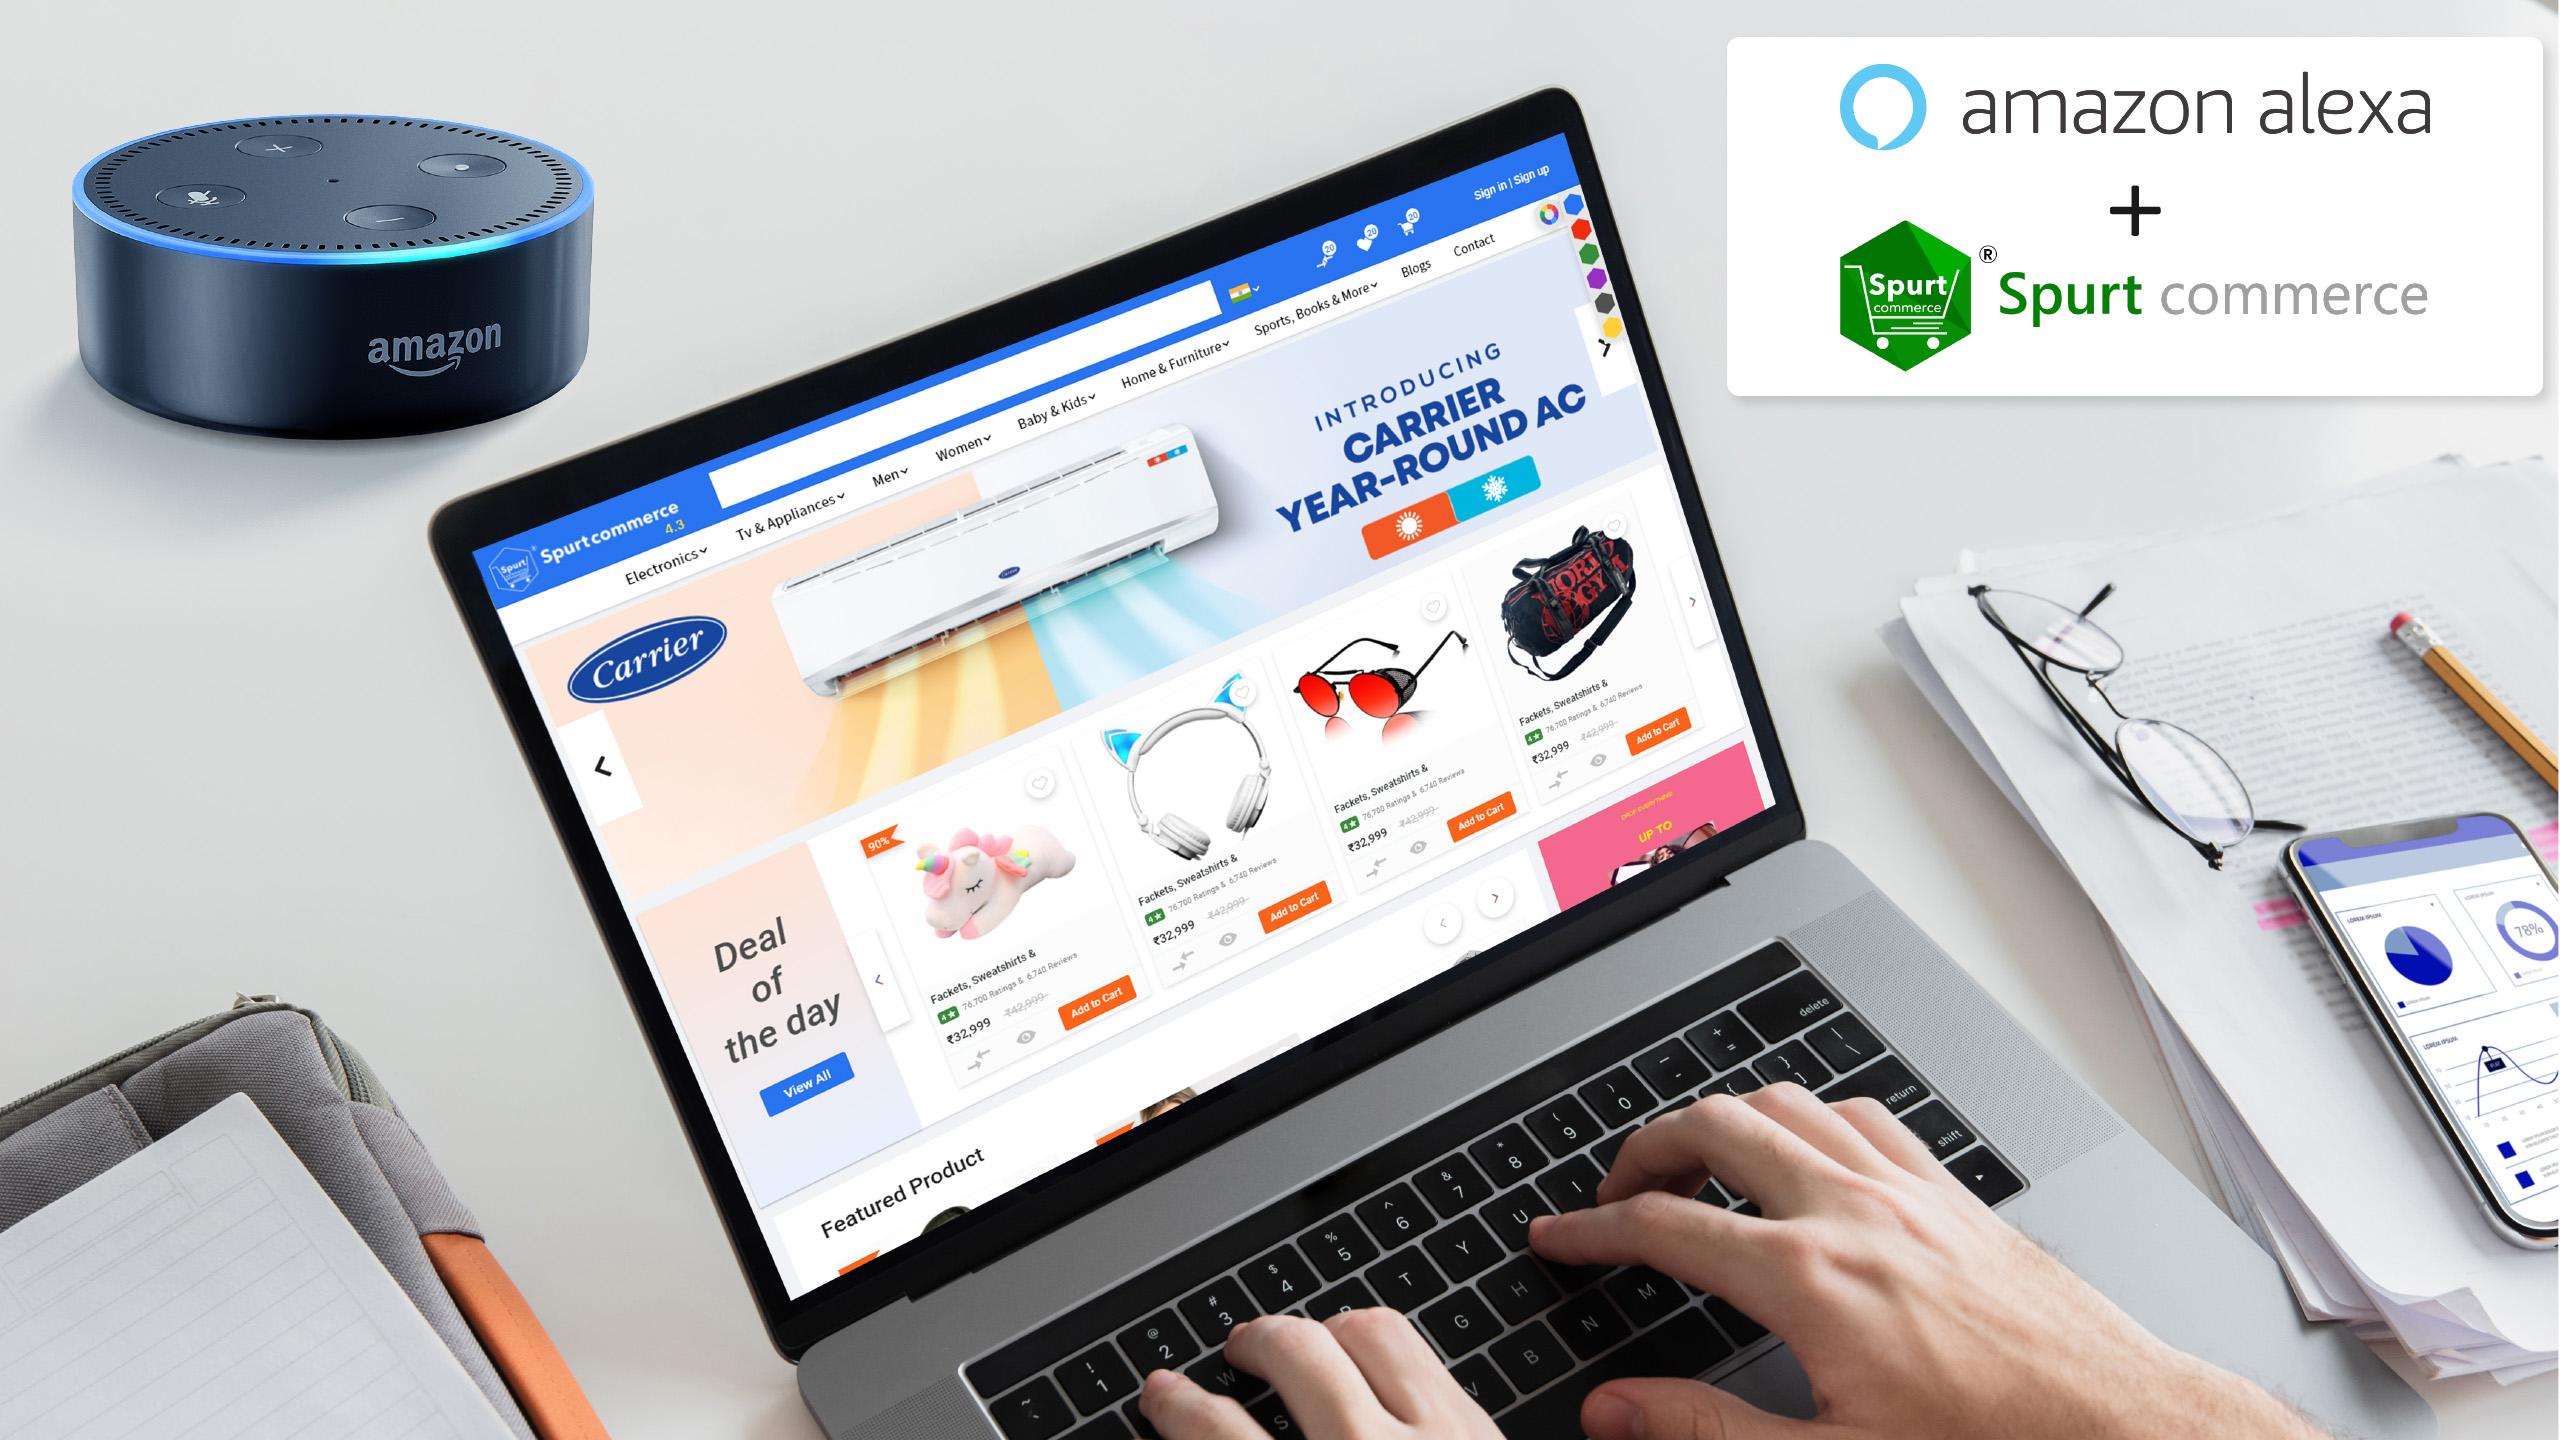 Alexa skill development, voice commerce, Alexa voice assistant, voice e-commerce, alexa skill ecommerce, spurtcommerce alexa skill ecommerce, spurtcommerce alexa skill solution.